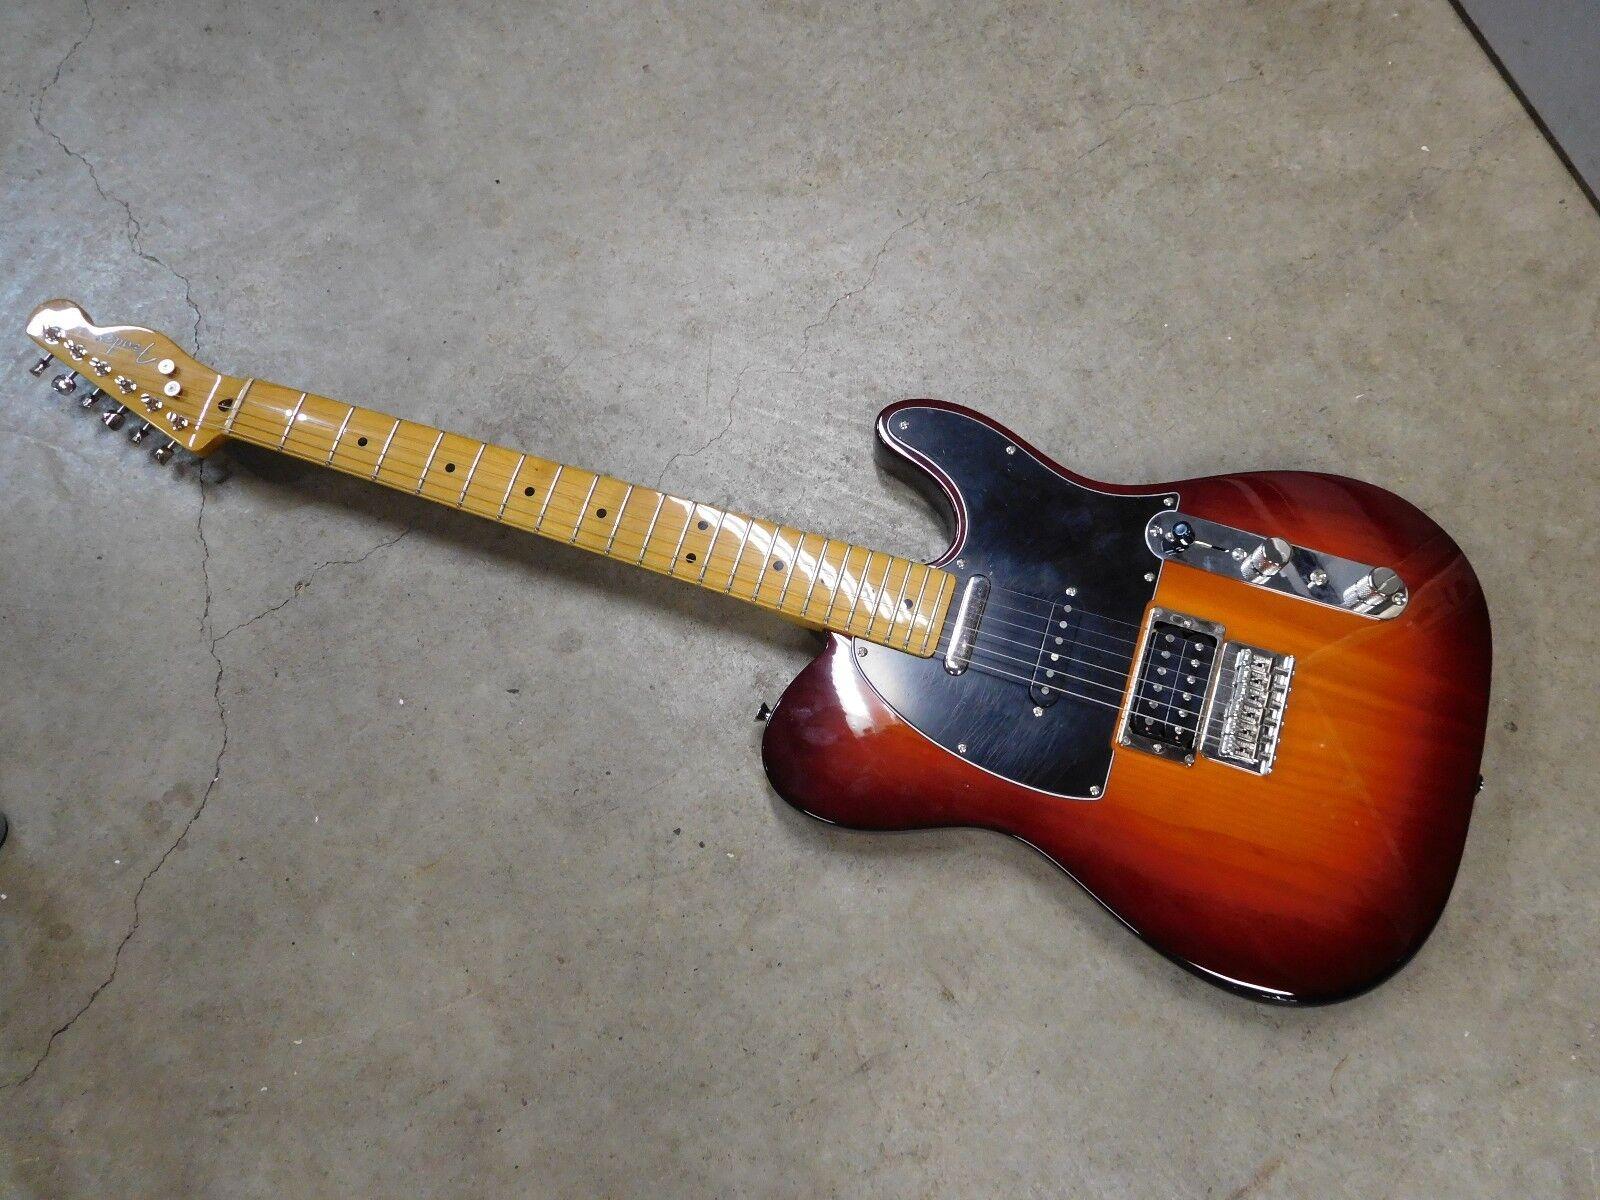 Fender Stratocaster Made In China : fender telecaster plus electric guitar made in china 717669018757 ebay ~ Hamham.info Haus und Dekorationen